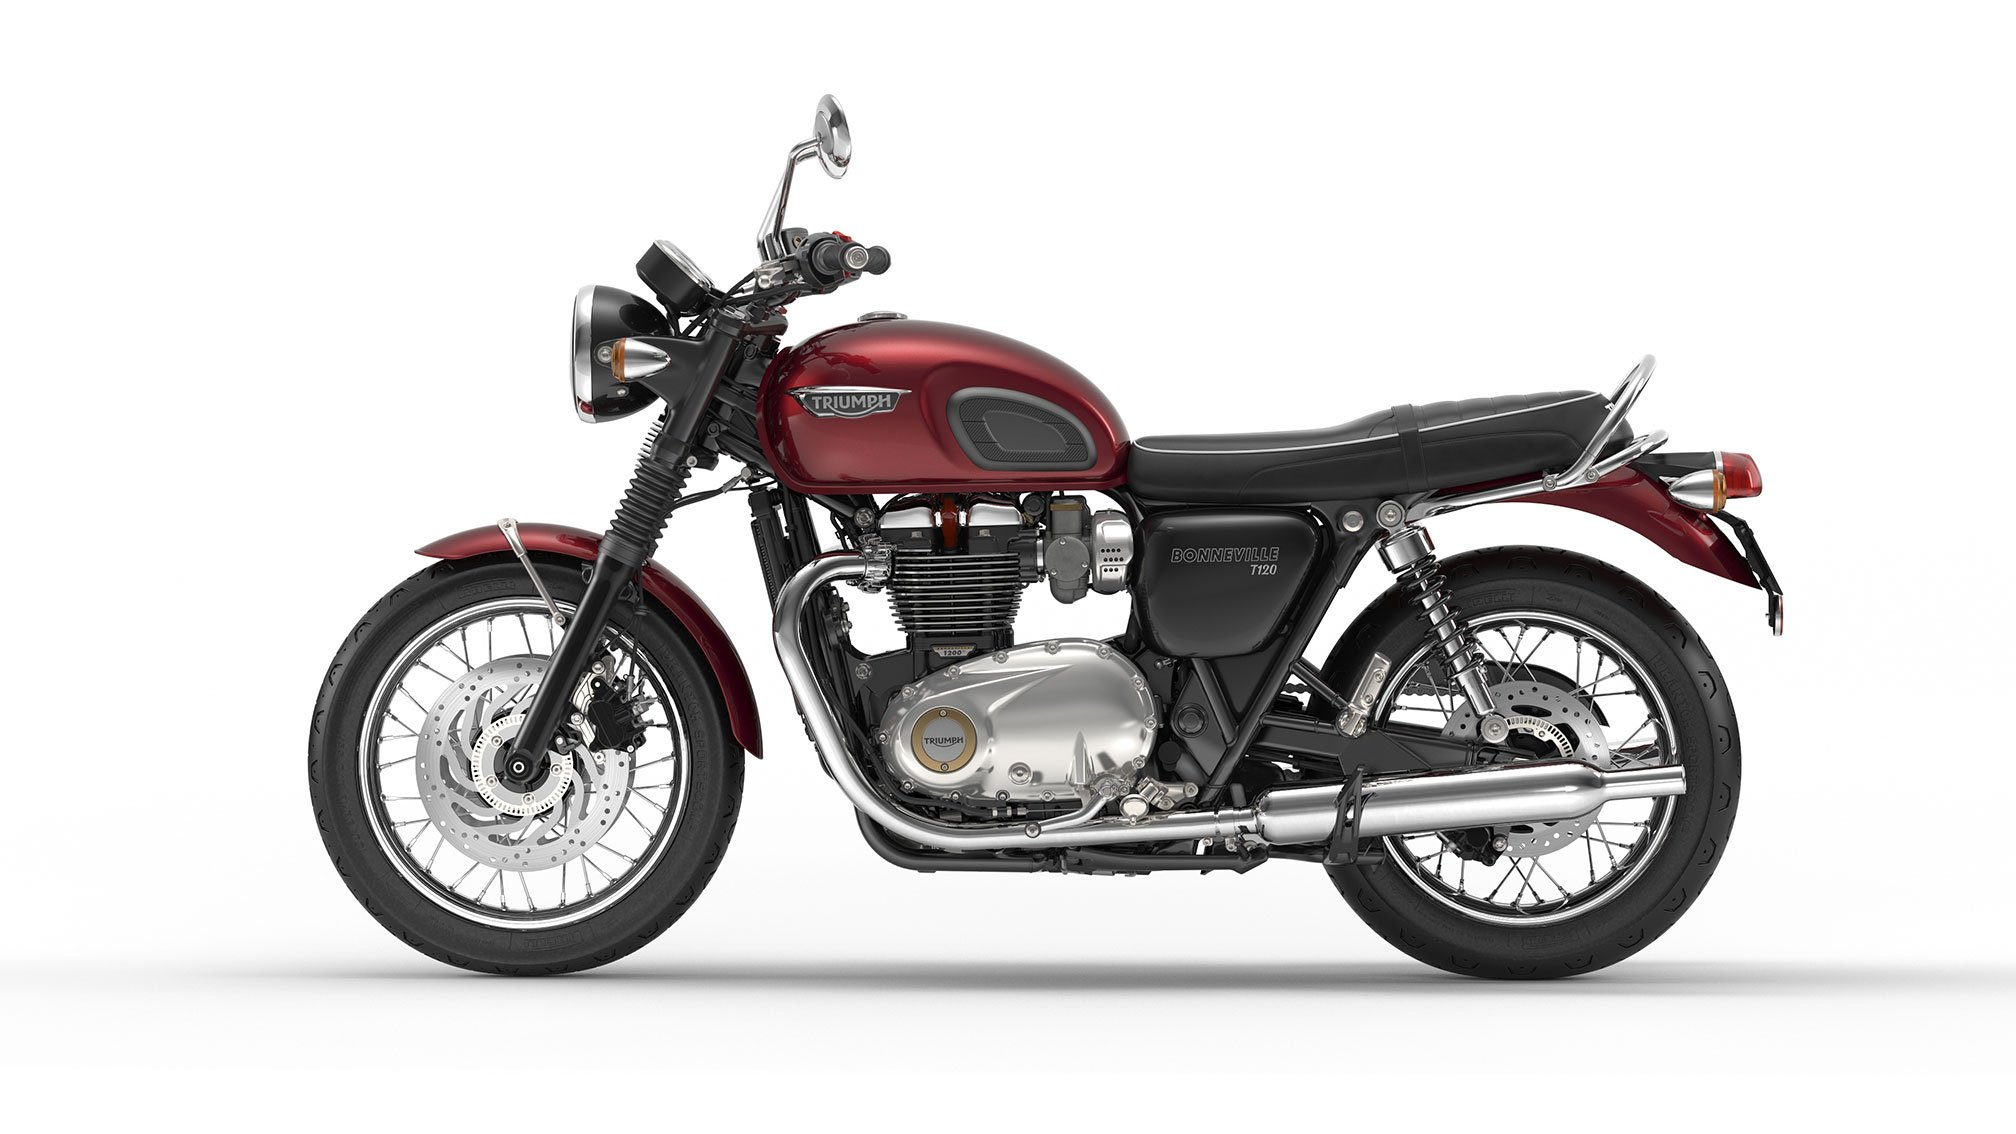 2016 Triumph Bonneville T120 bike motorbike motorcycle ...